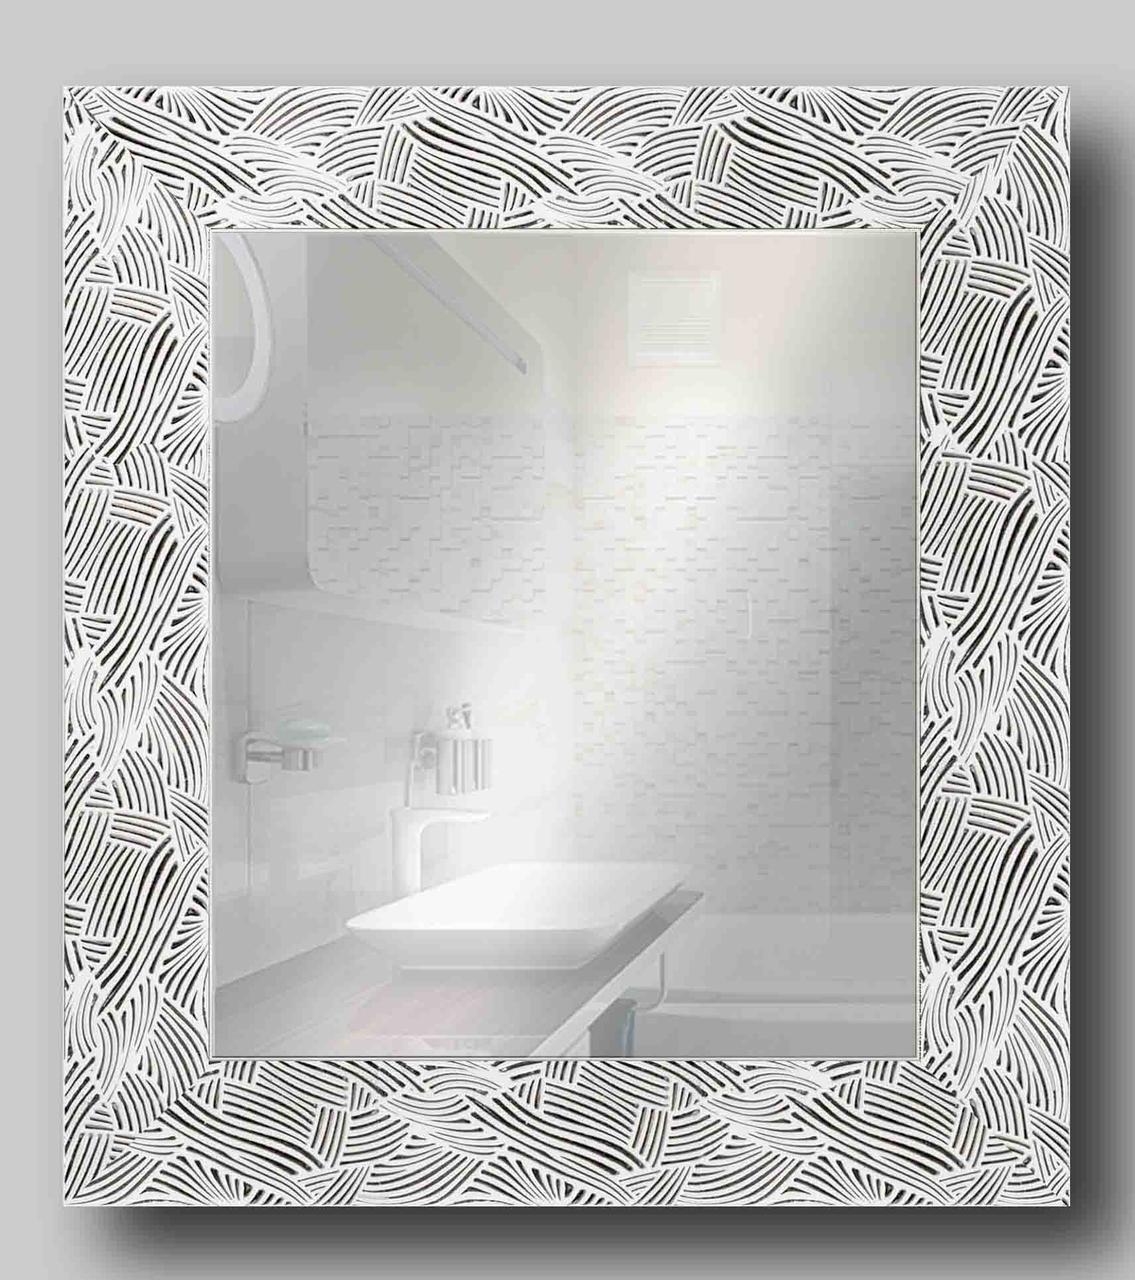 Зеркало настенное в раме Factura White pattern 48.5х53.5 см белое